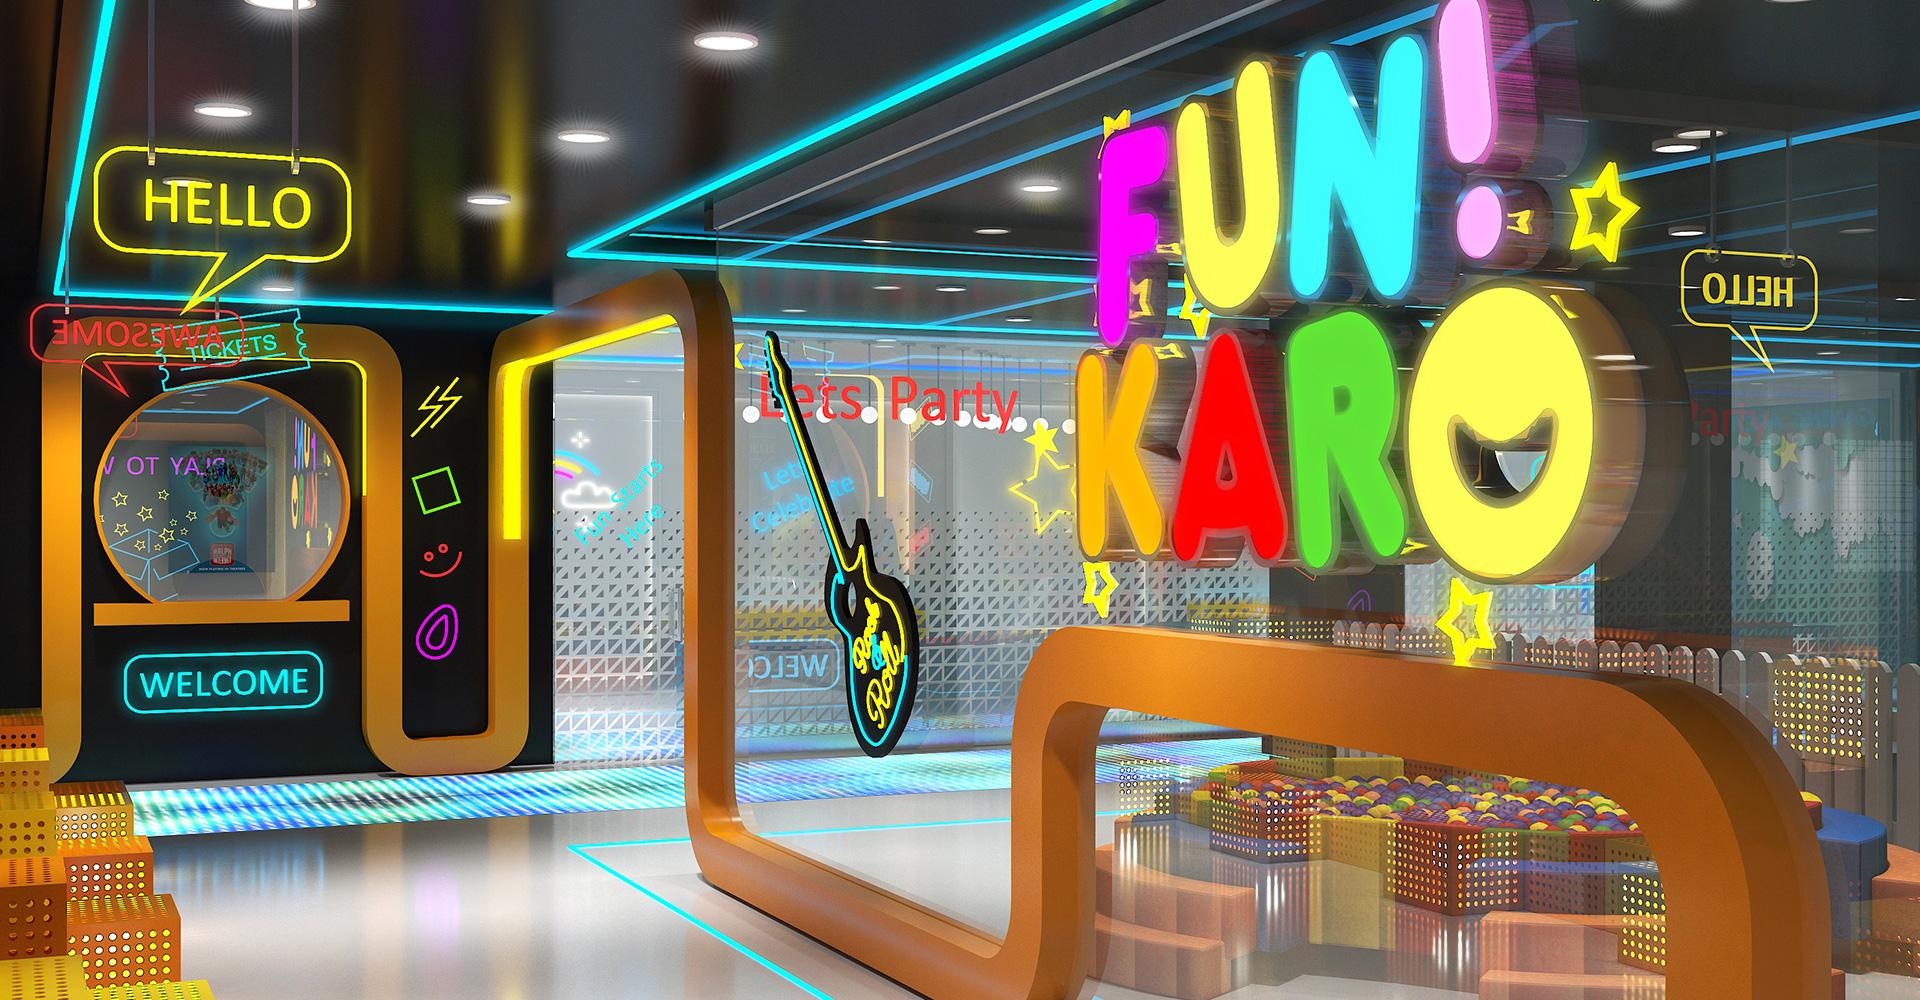 Interior-Design-Hiline-Lahore-portfolio-Fun-Karo-Jasmine-Mall-01